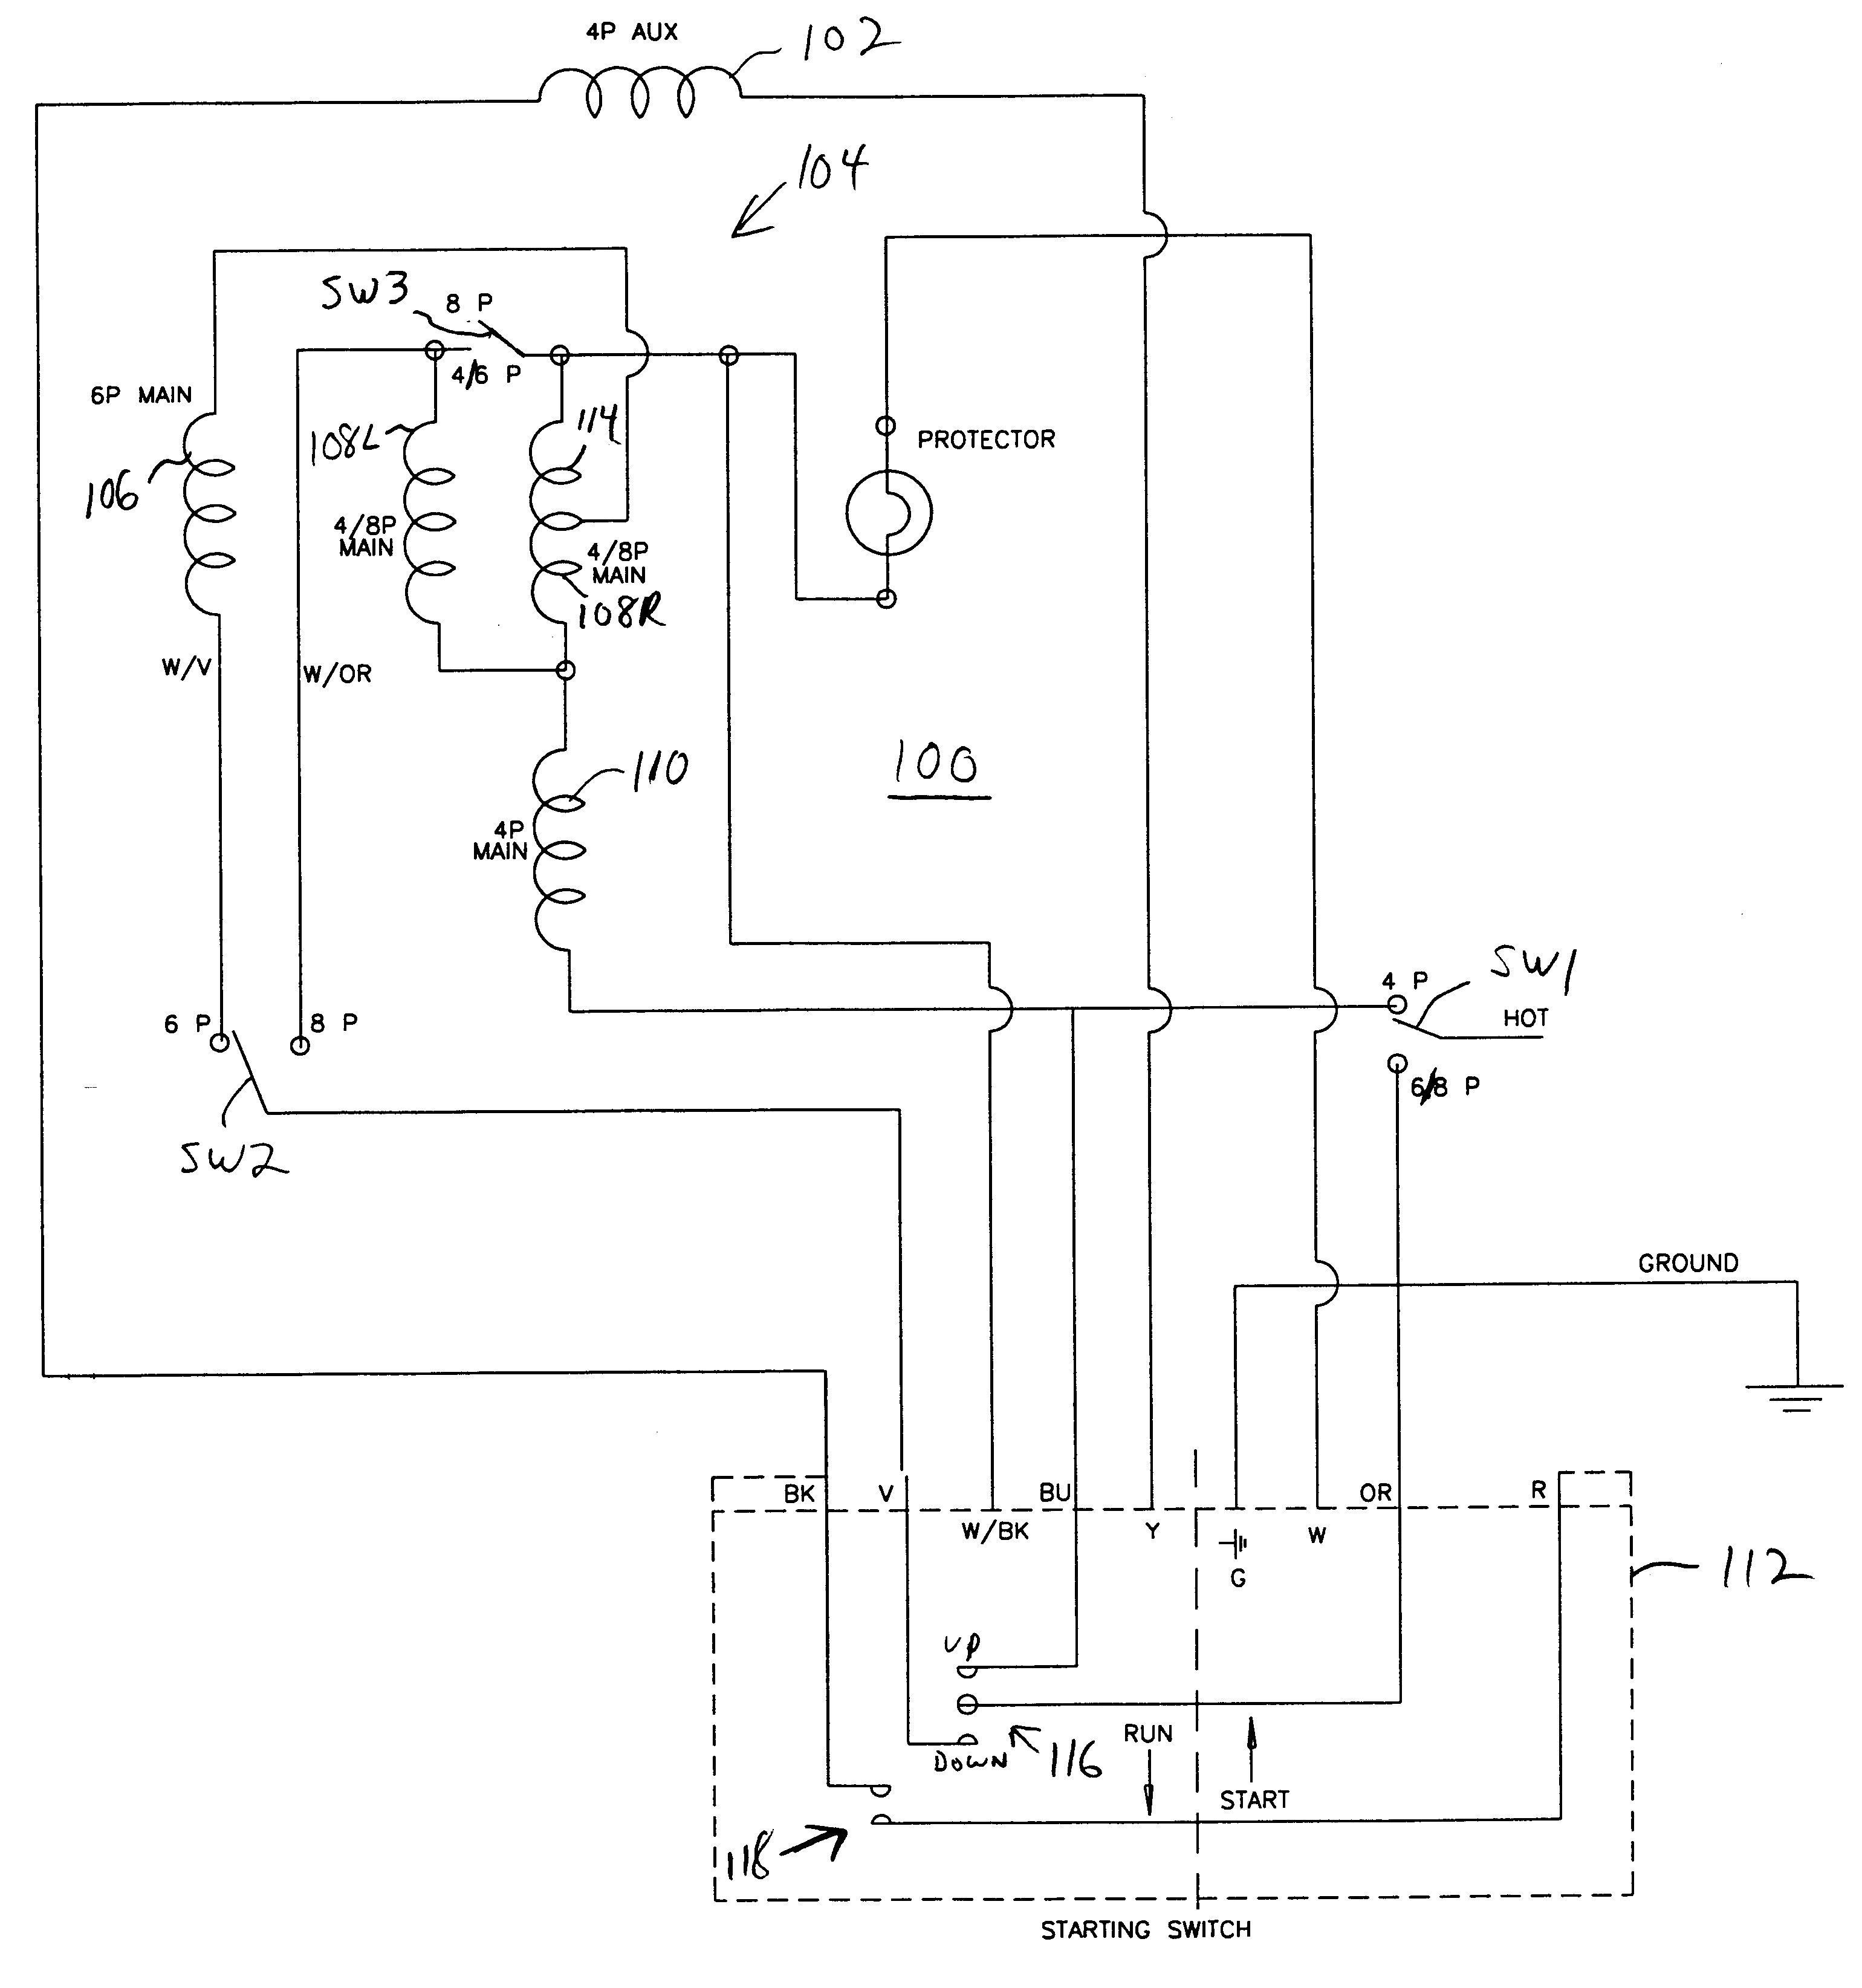 New Wiring Diagram for Ac Blower Motor Diagram